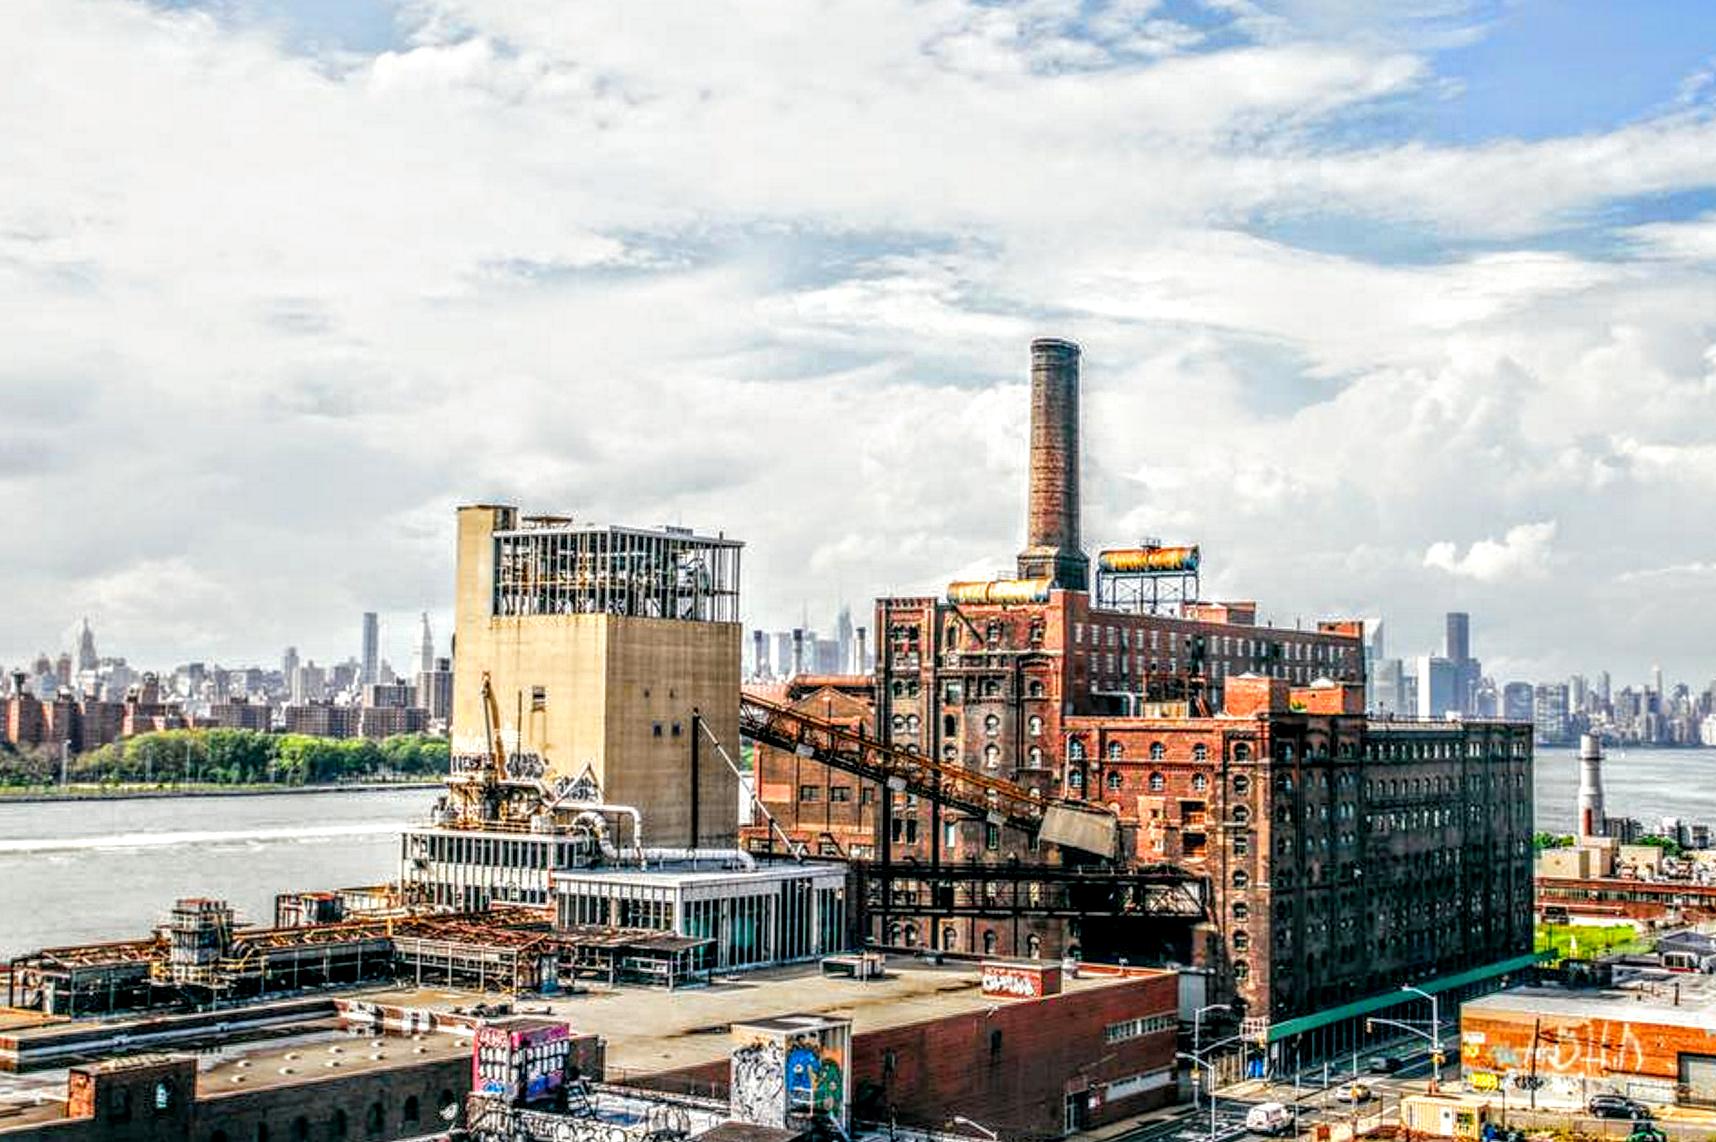 View_in_Williamsburg_Brooklyn.png